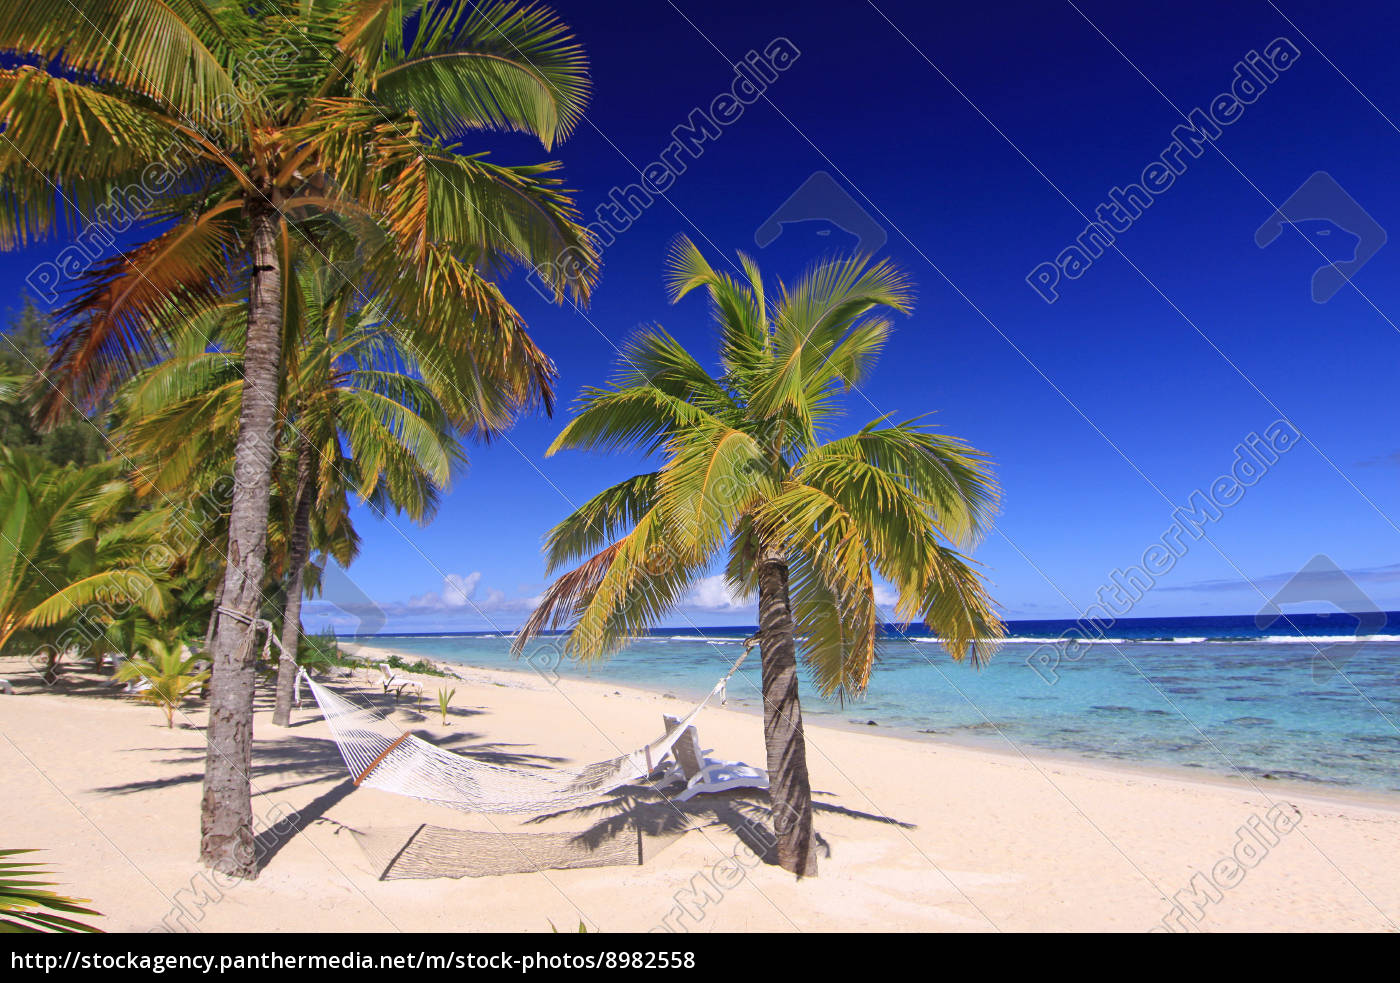 strand palme sandstrand palmen t rkis lagune riff stockfoto 8982558 bildagentur panthermedia. Black Bedroom Furniture Sets. Home Design Ideas